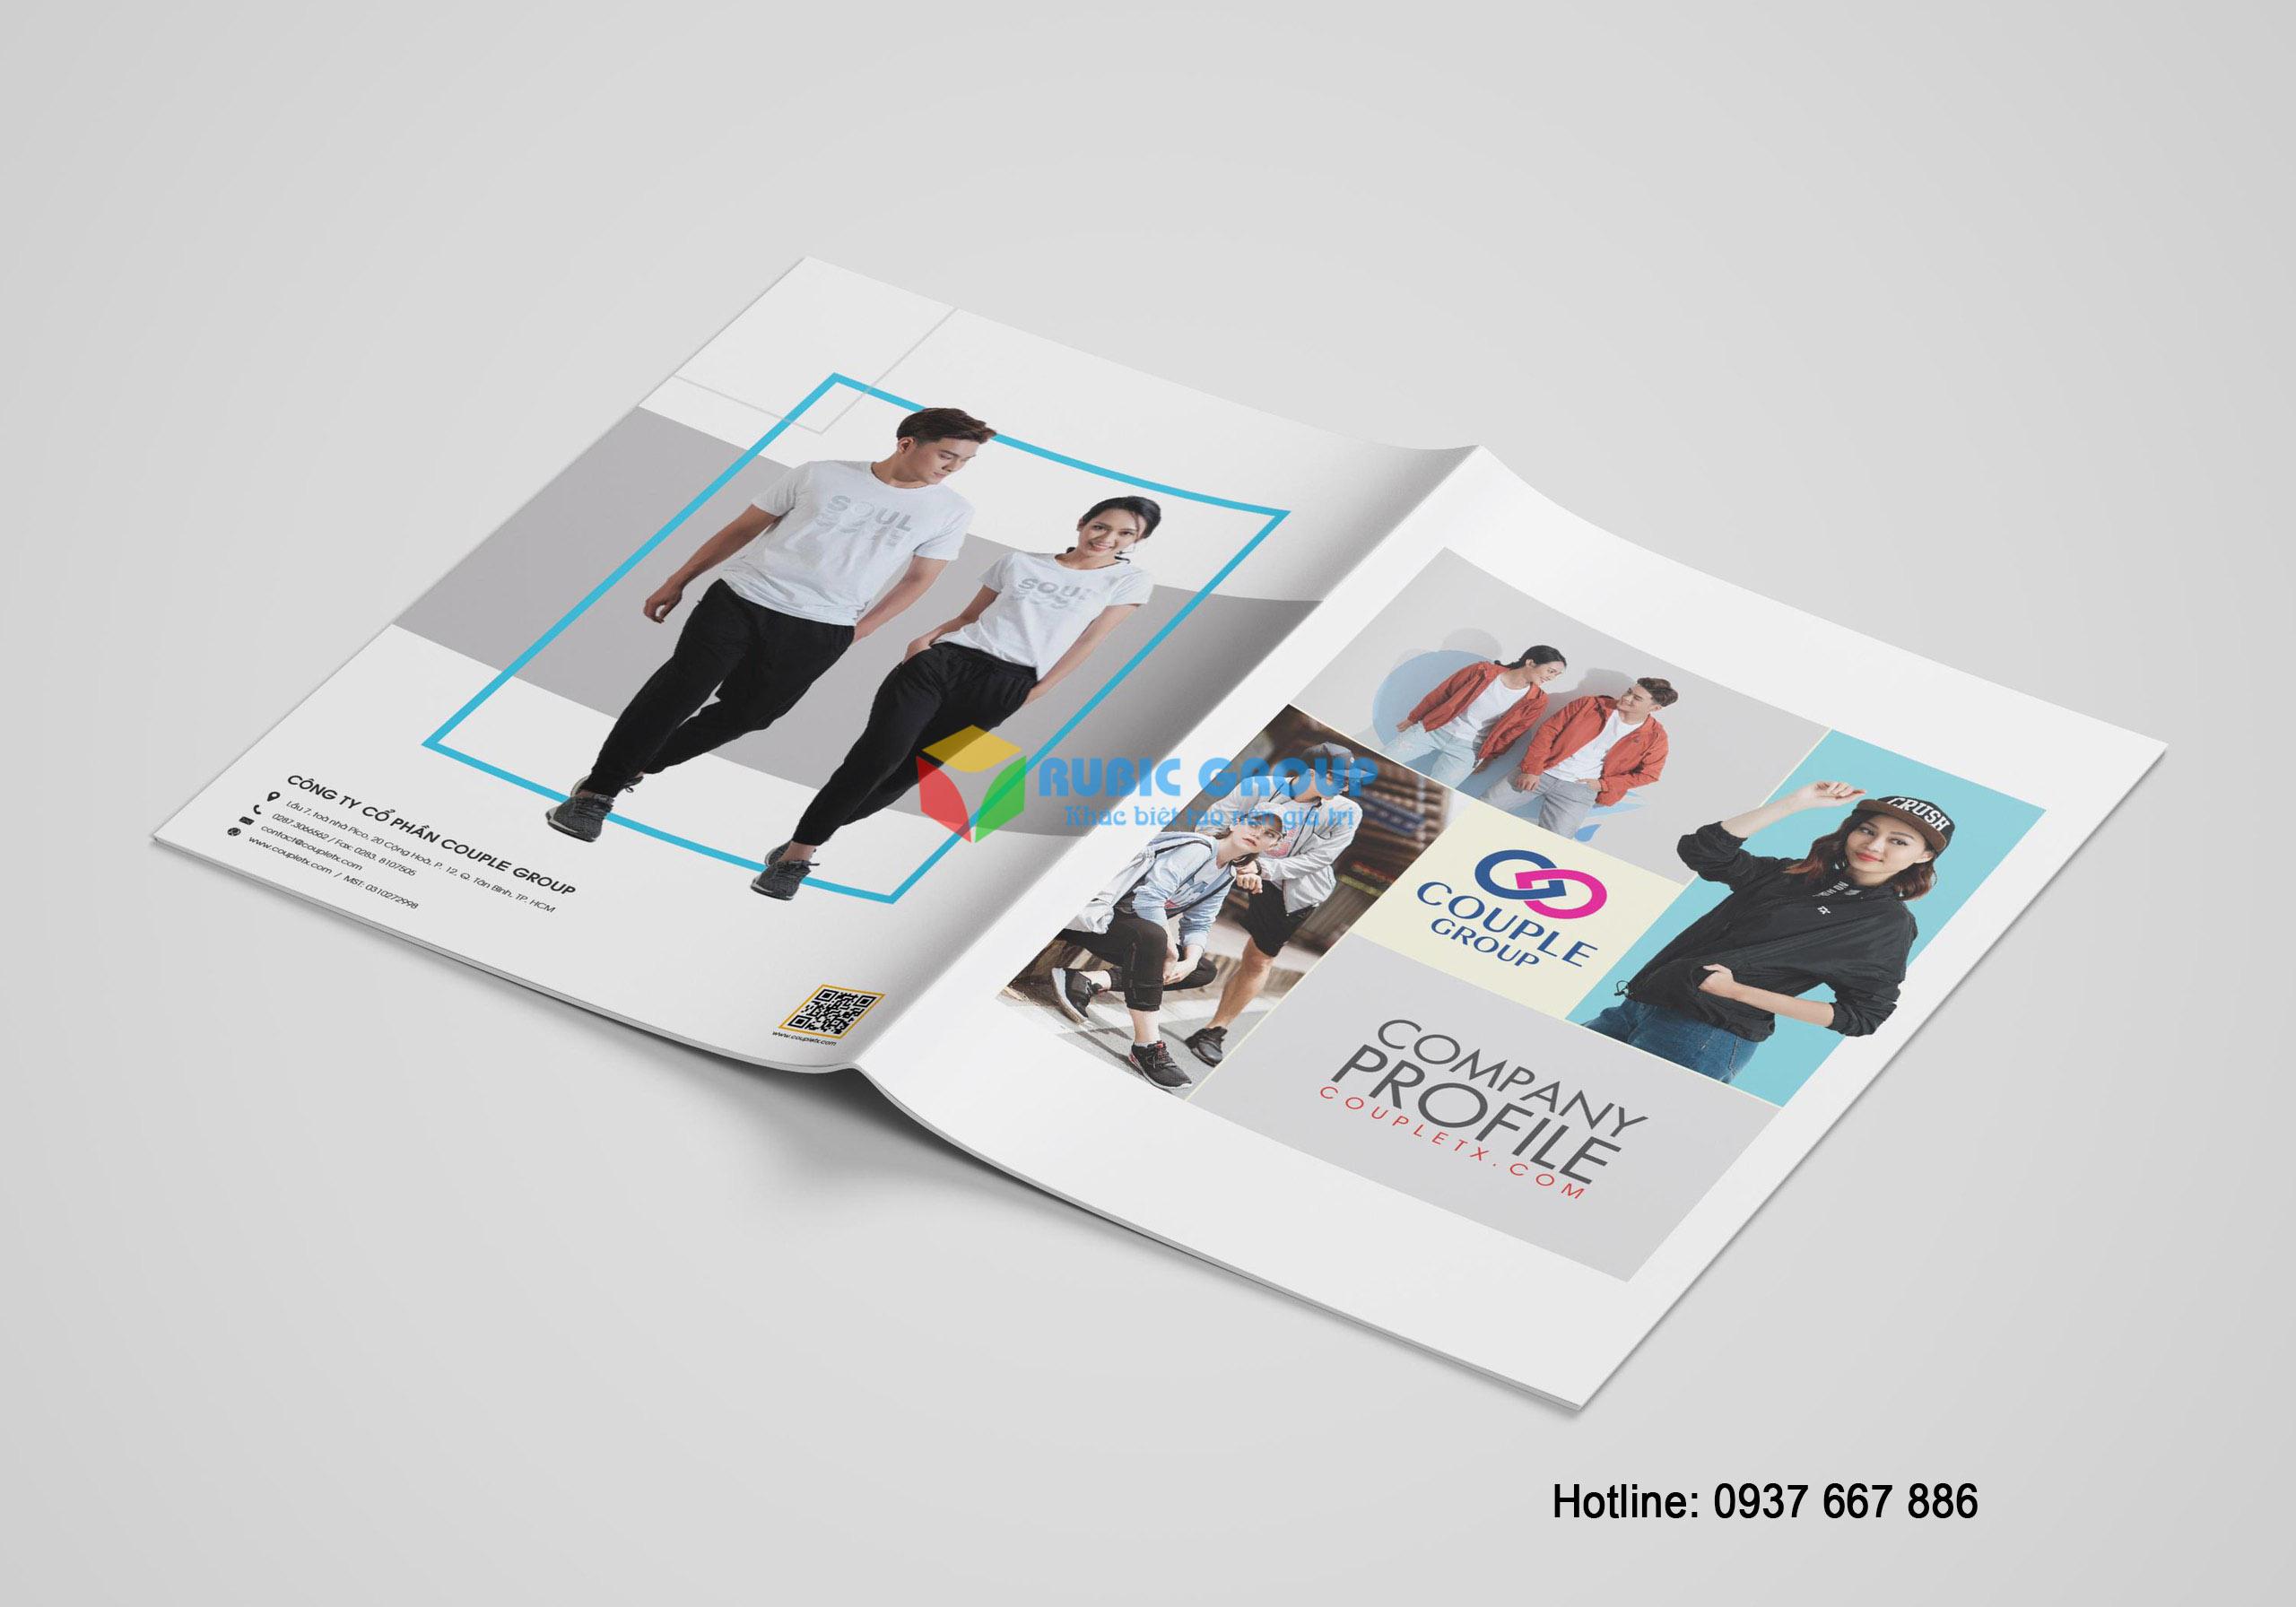 thiết kế profile thời trang couple group 1